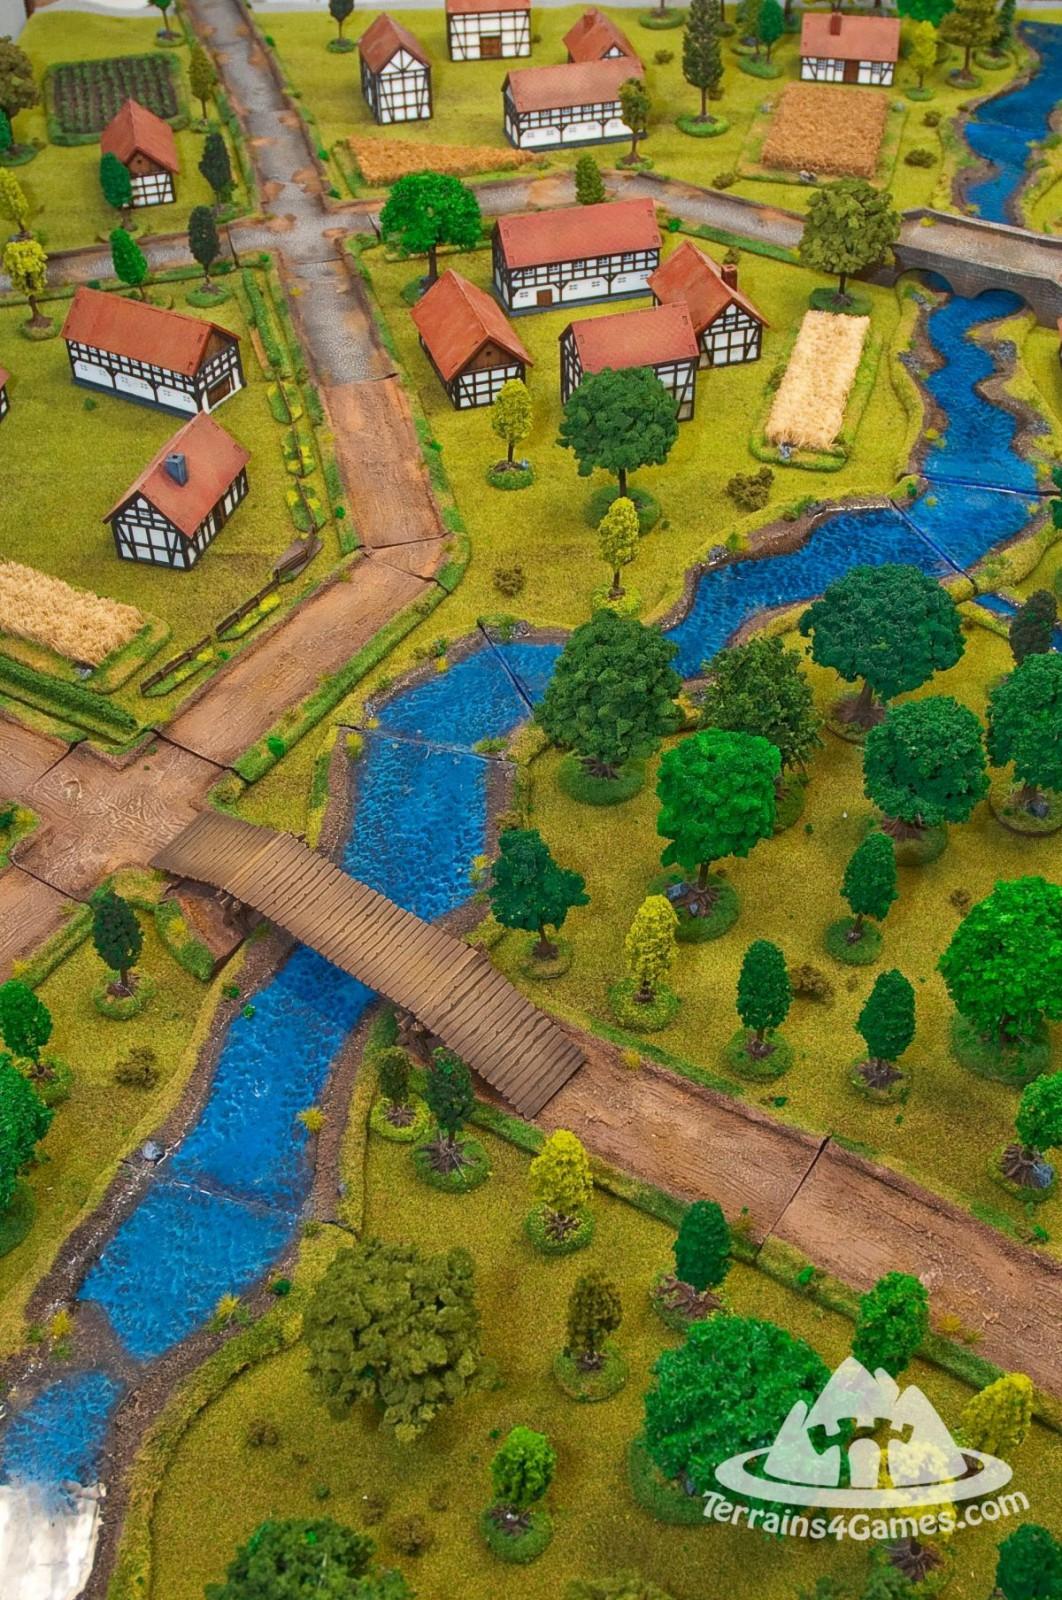 Mega Terrains set with battlemate - 222 elements!